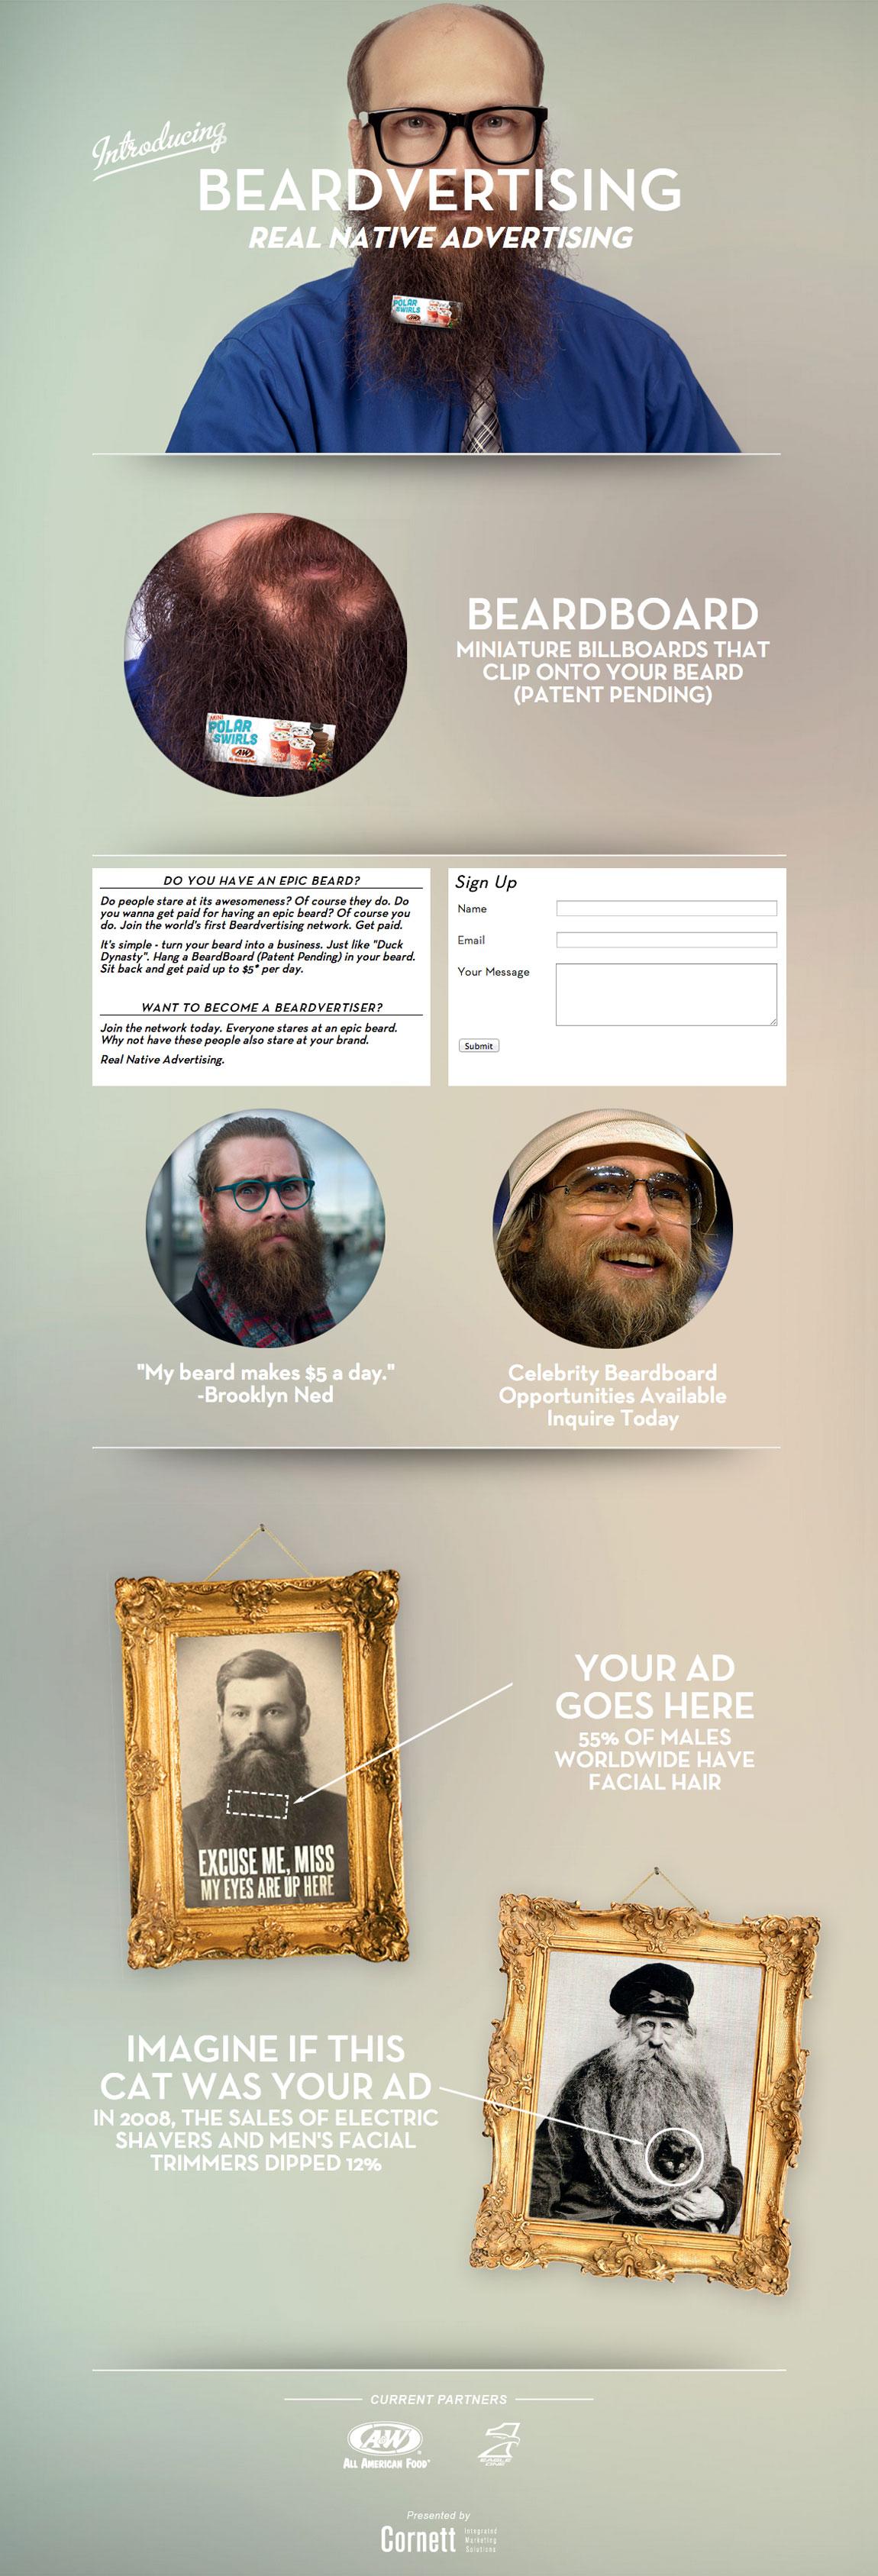 Beardvertising Website Screenshot